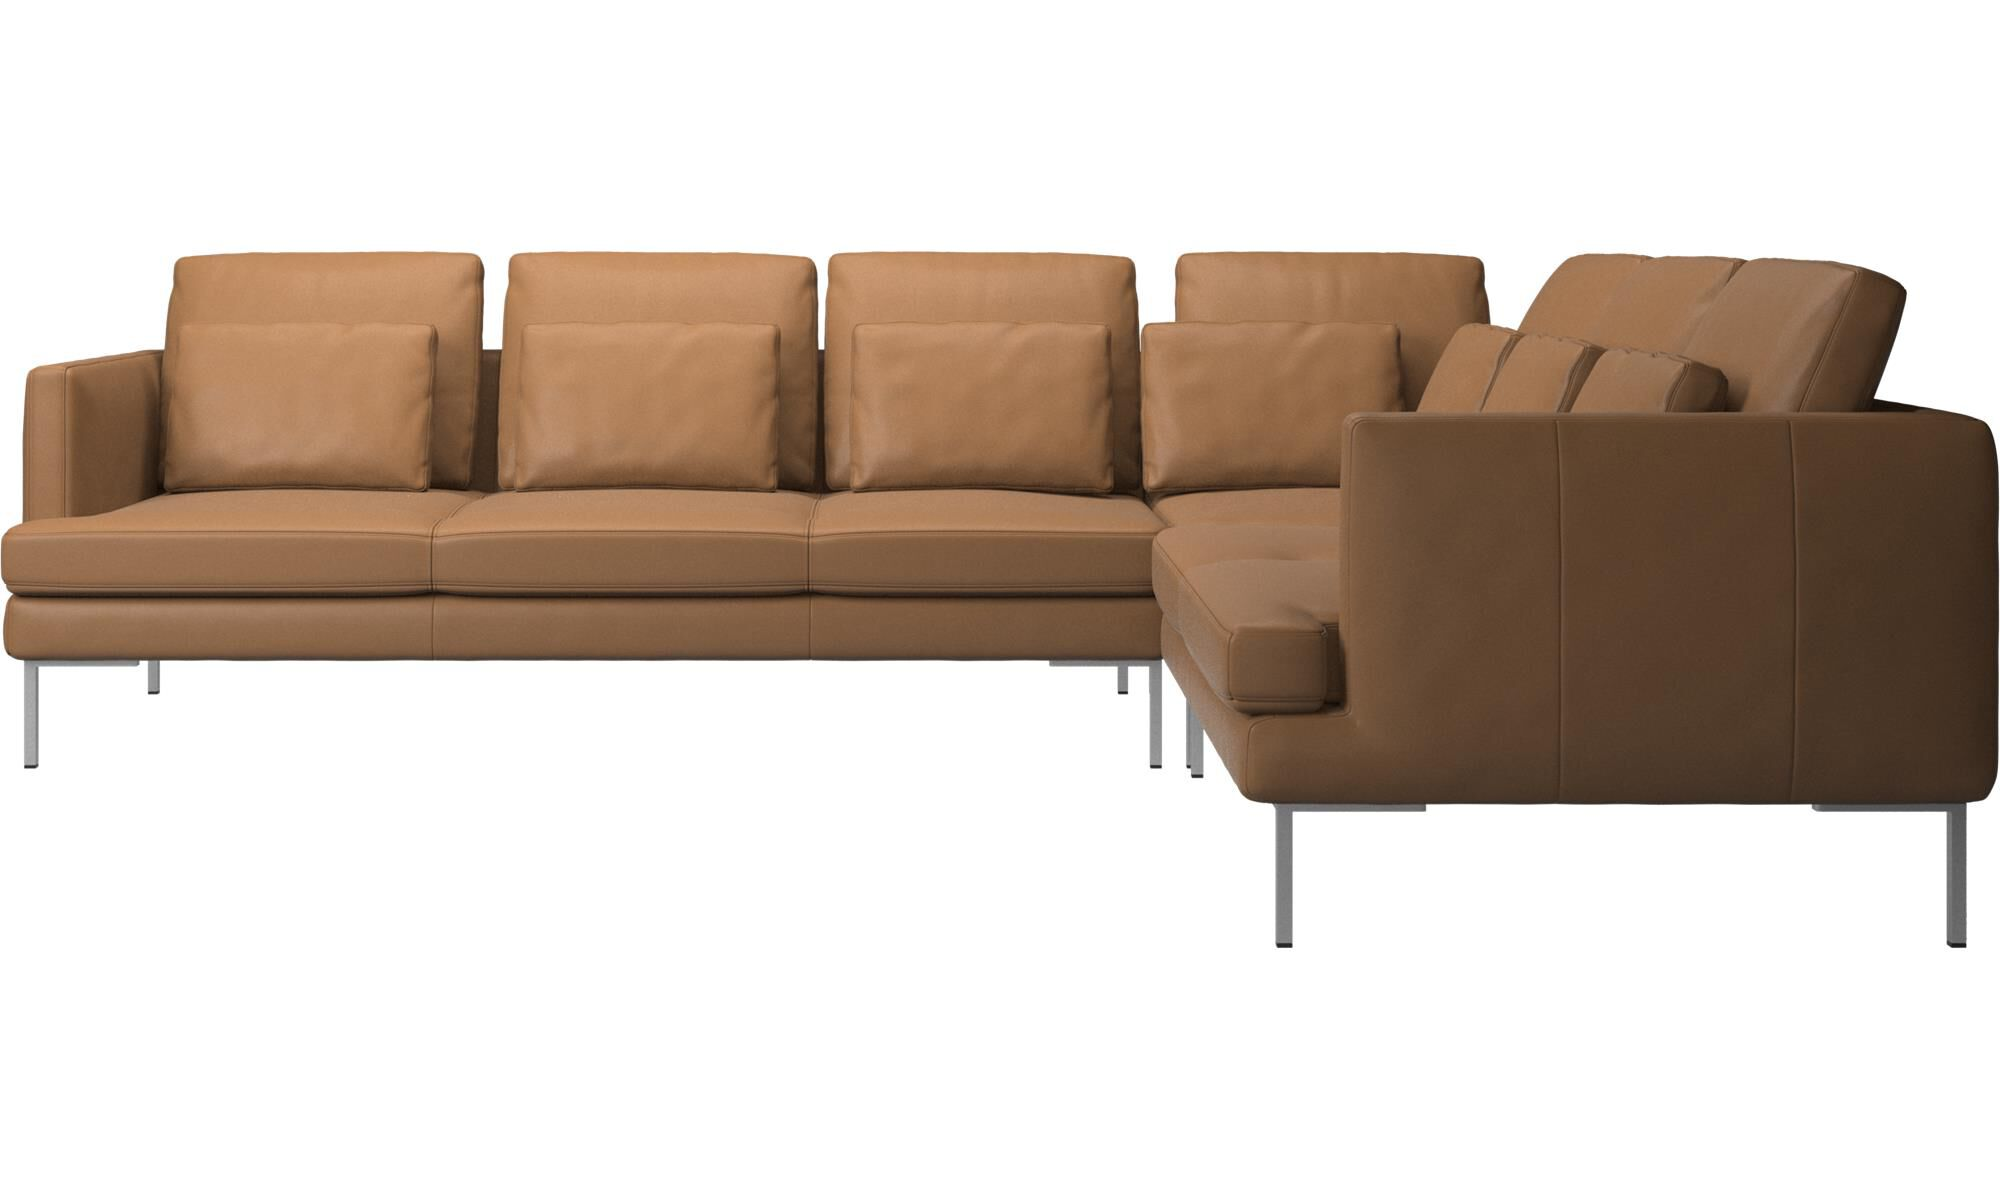 Superior Corner Sofas   Istra 2 Corner Sofa   Brown   Leather